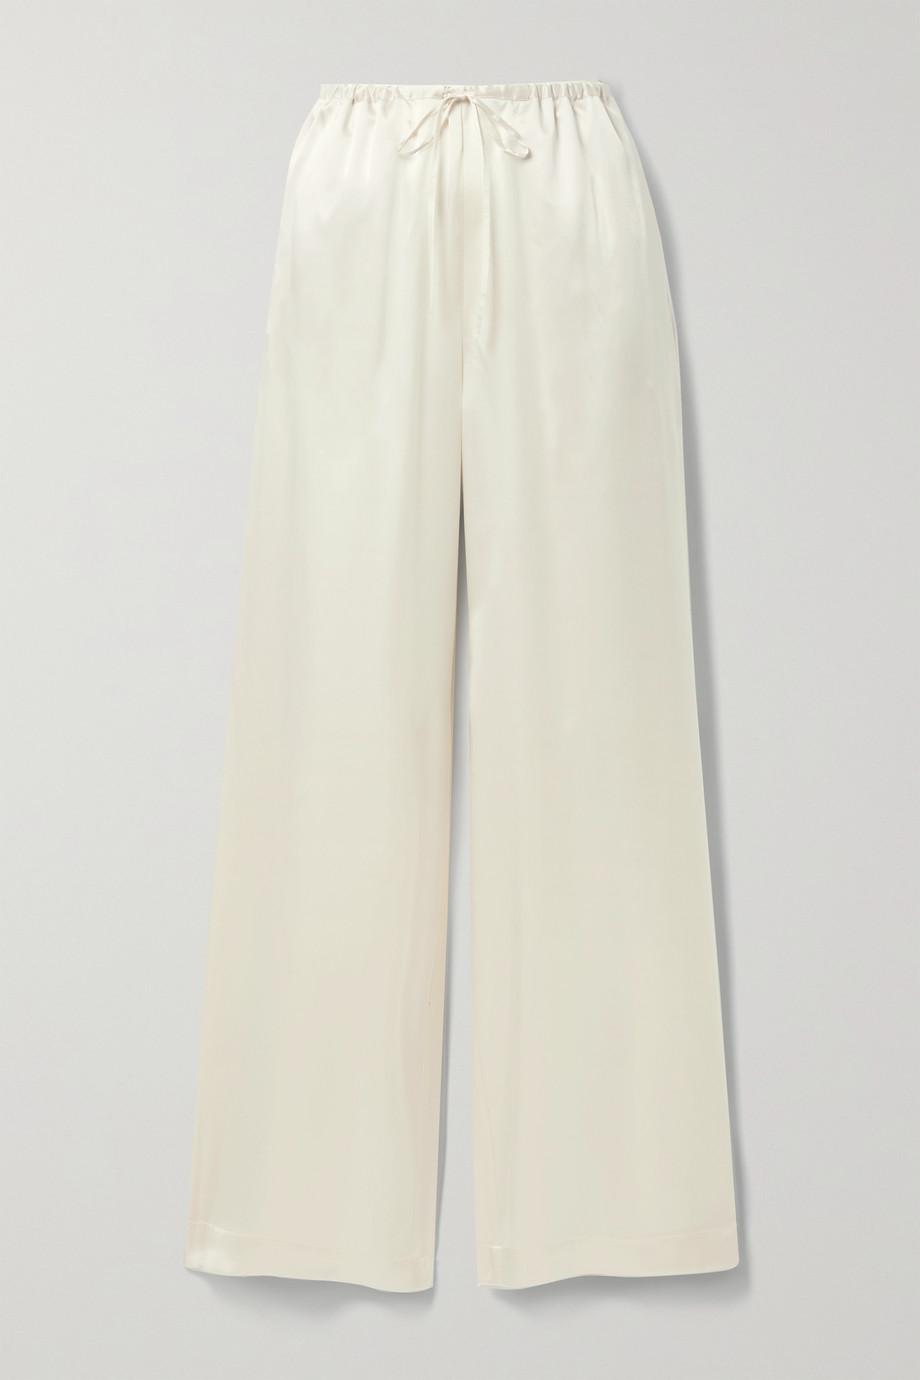 Rosetta Getty Silk-satin wide-leg pants